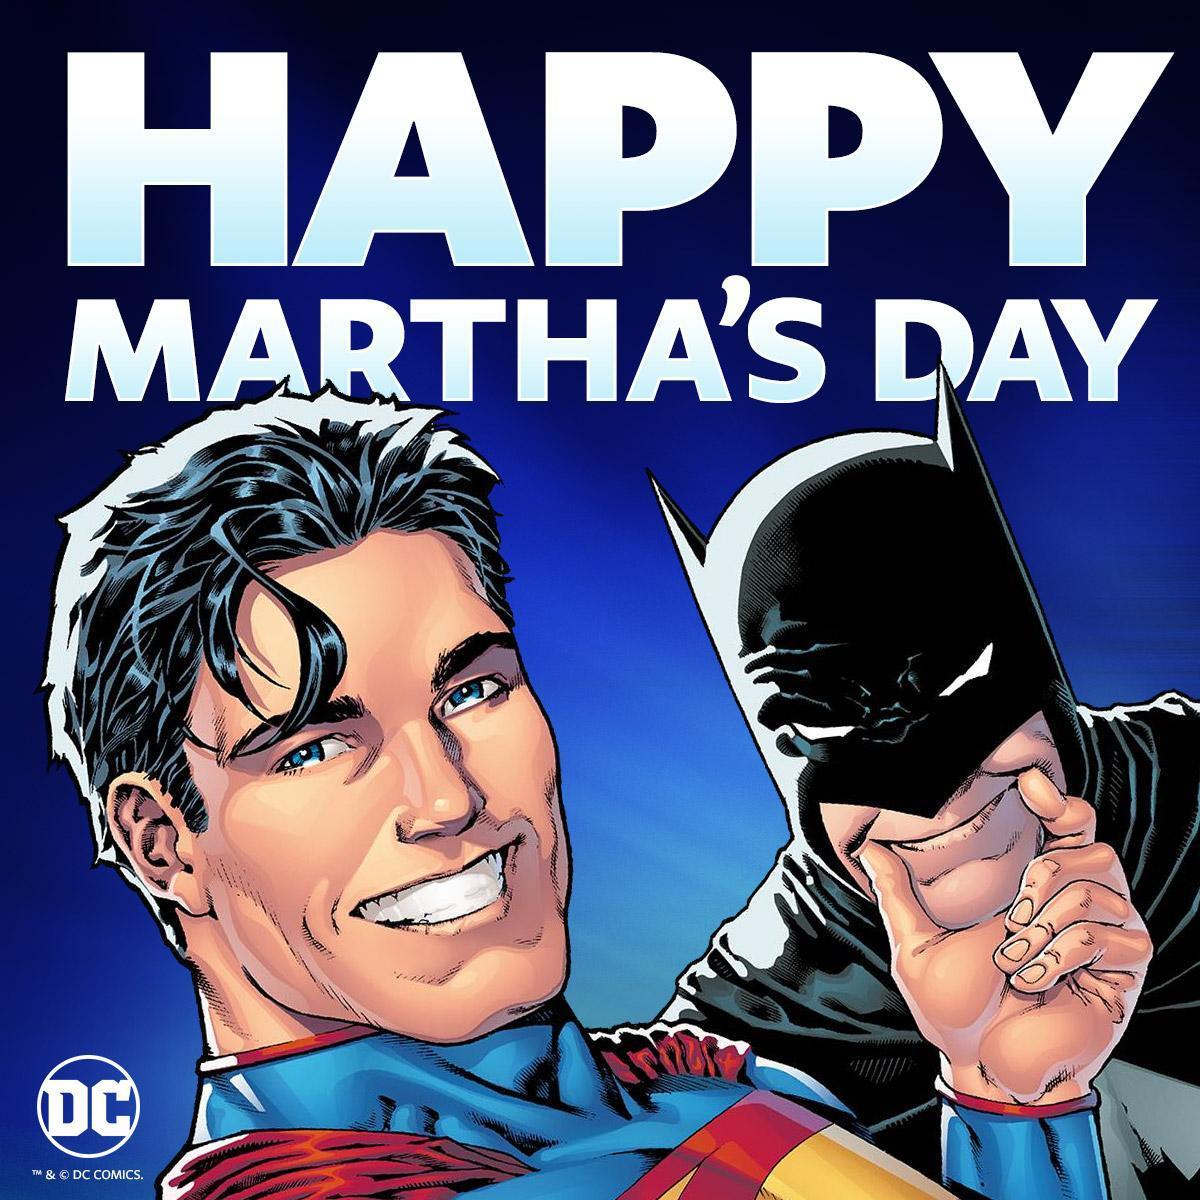 Is Free Comic Book Day Worth It Reddit: Happy Martha's Day